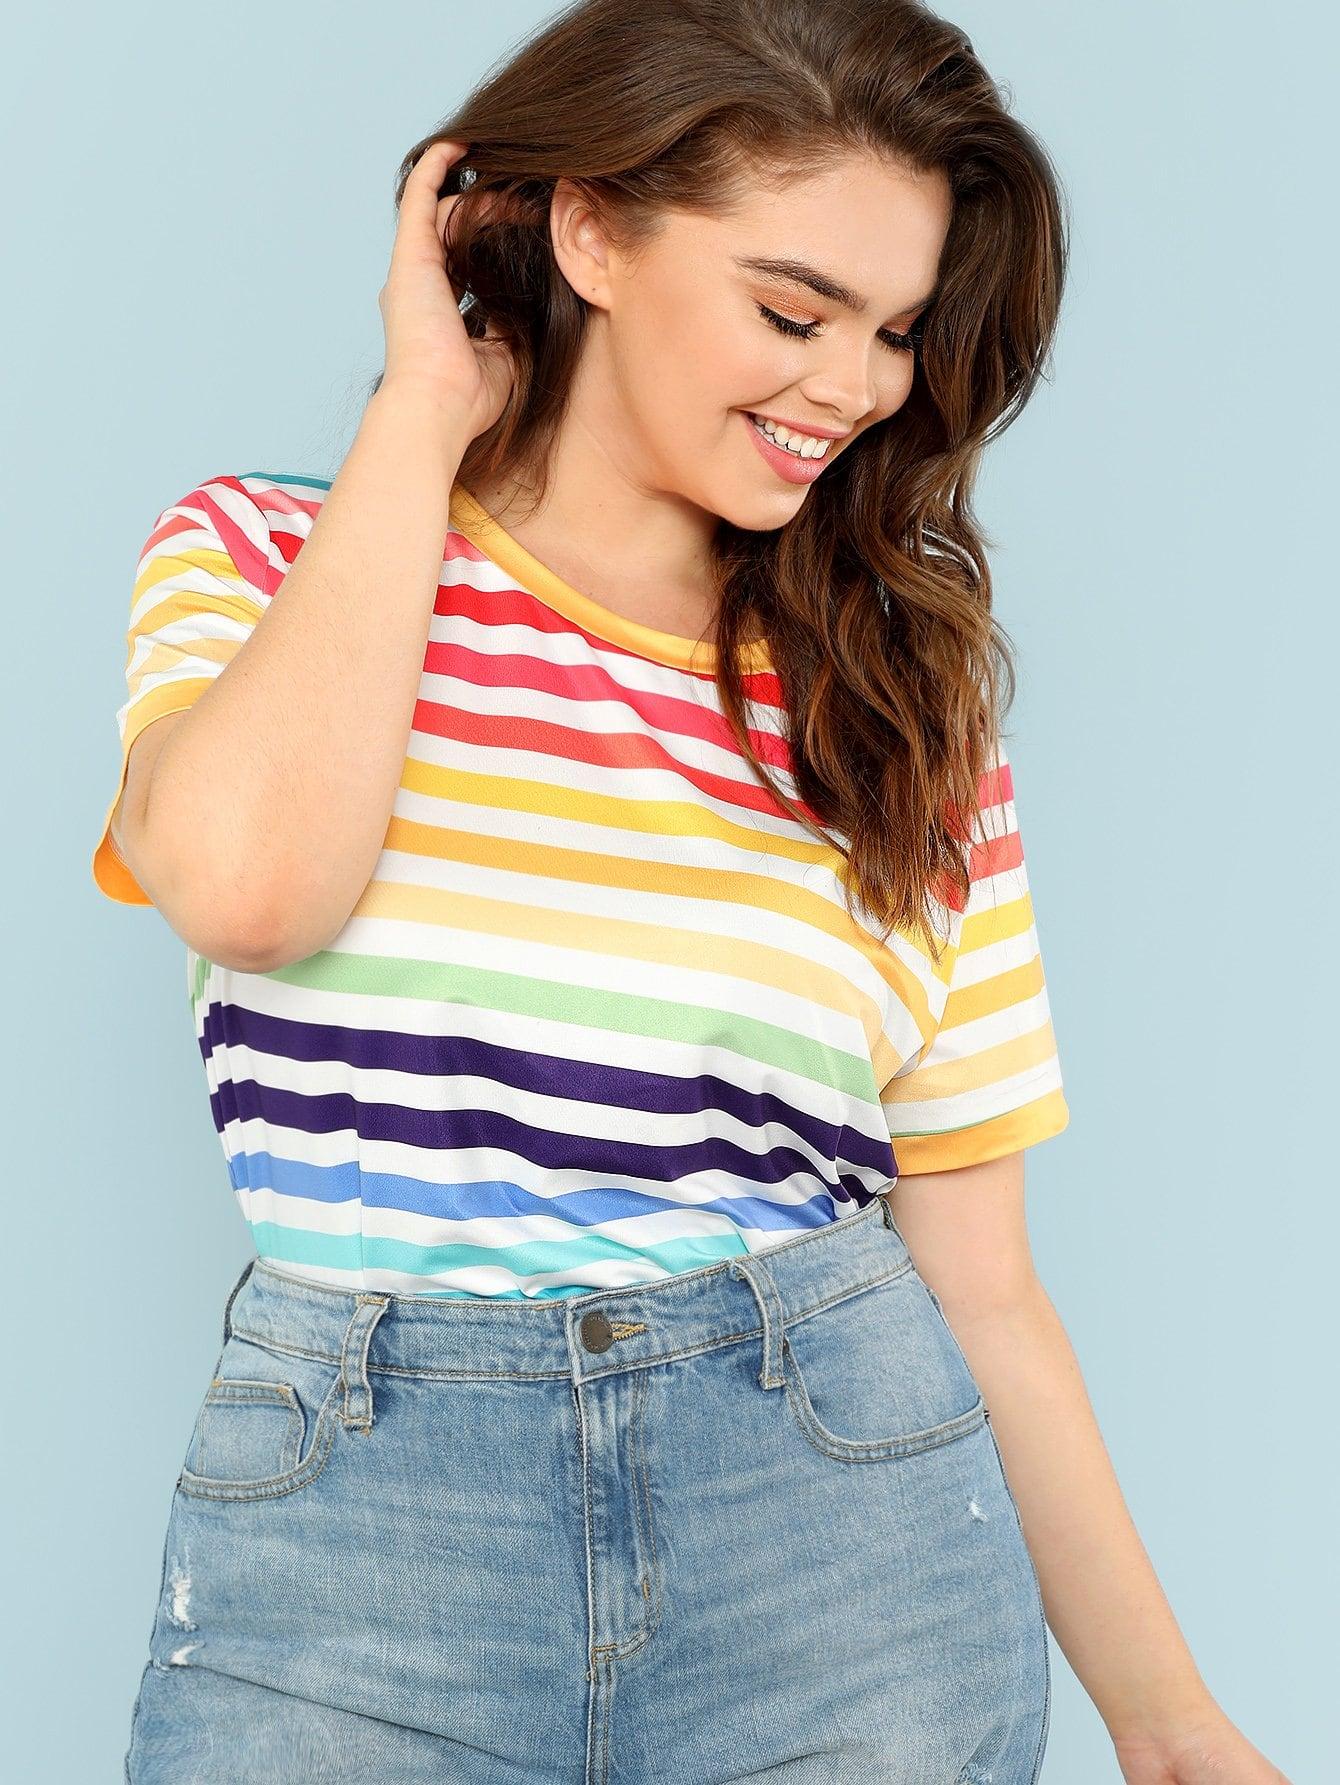 Купить Плюс Цветная полосатая футболка, Faith Bowman, SheIn